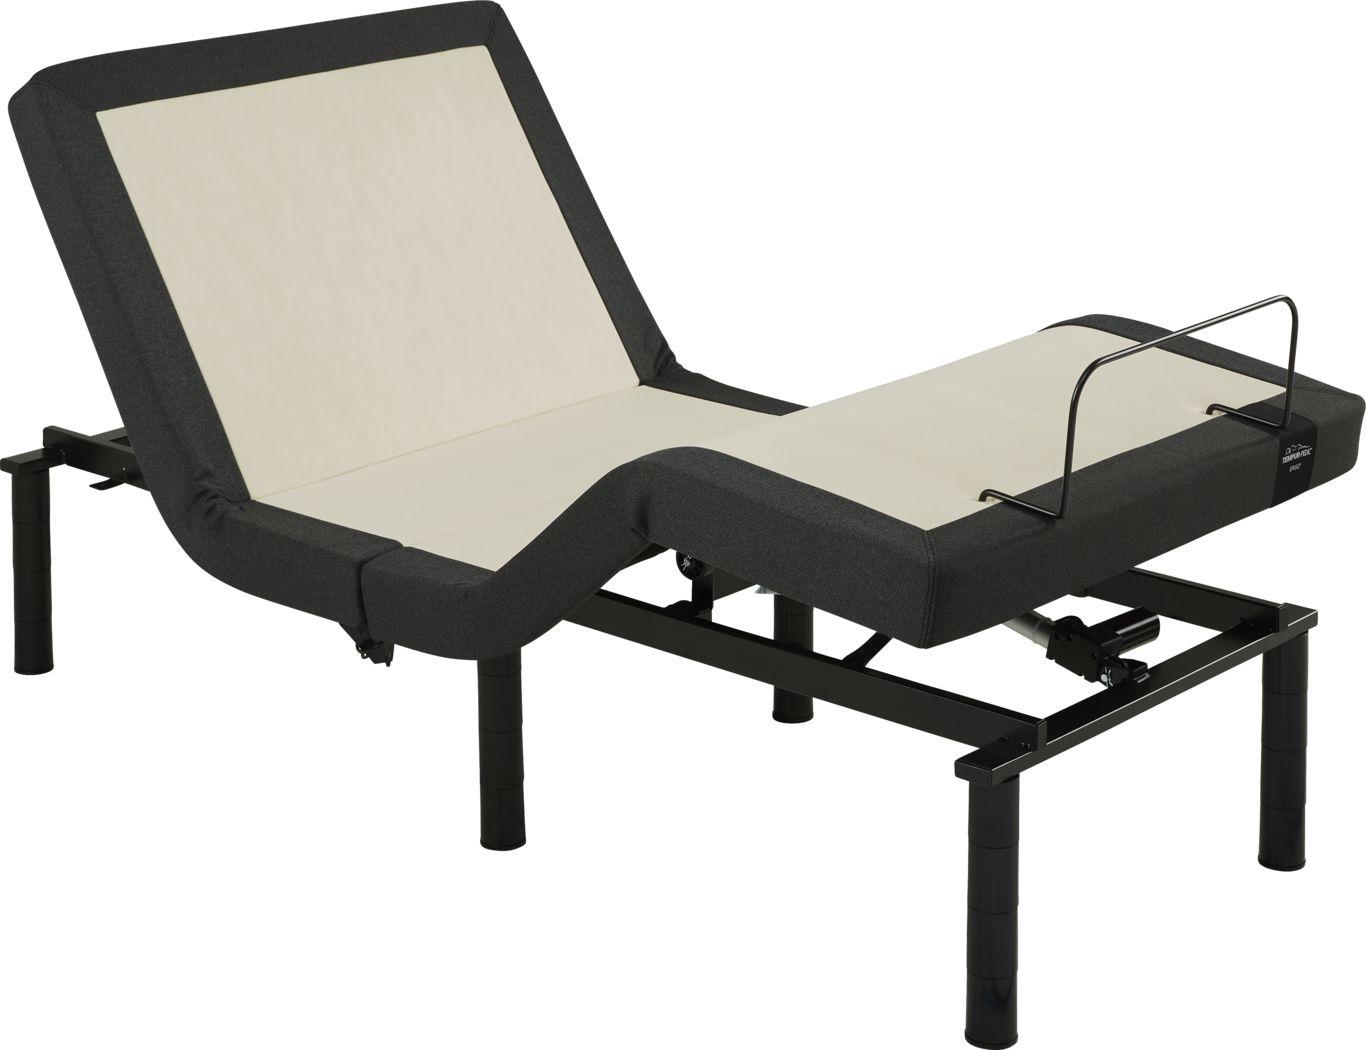 Tempur-Pedic Ergo Twin XL Adjustable Base